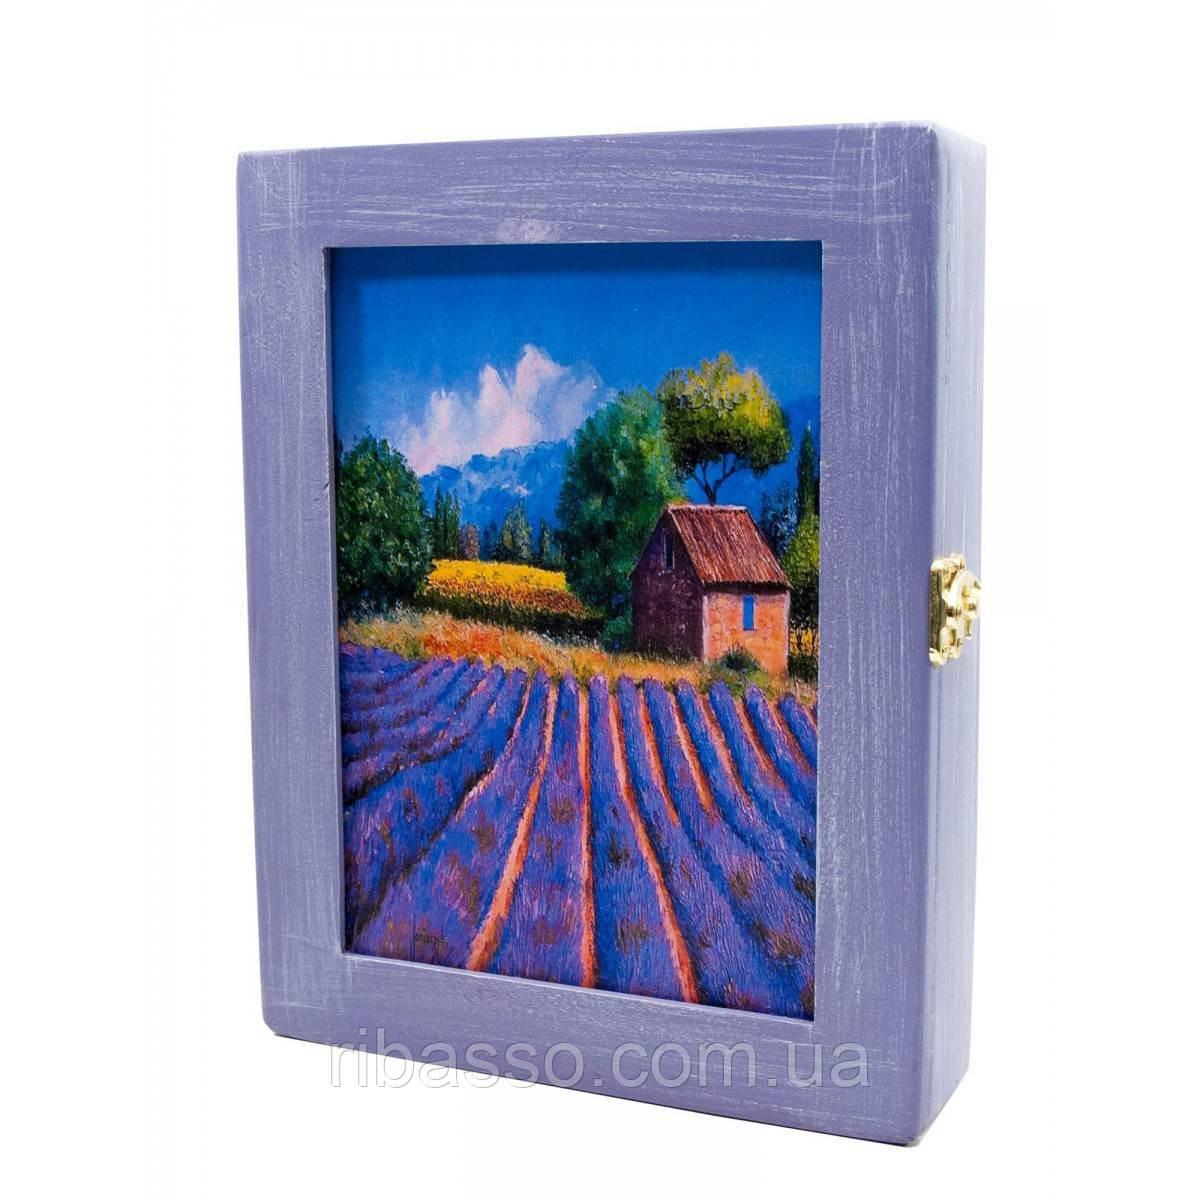 "Ключница ""Лаванда"", фиолетовая,массив дерева 25,5х19,5х5,5 см.A 26071A"